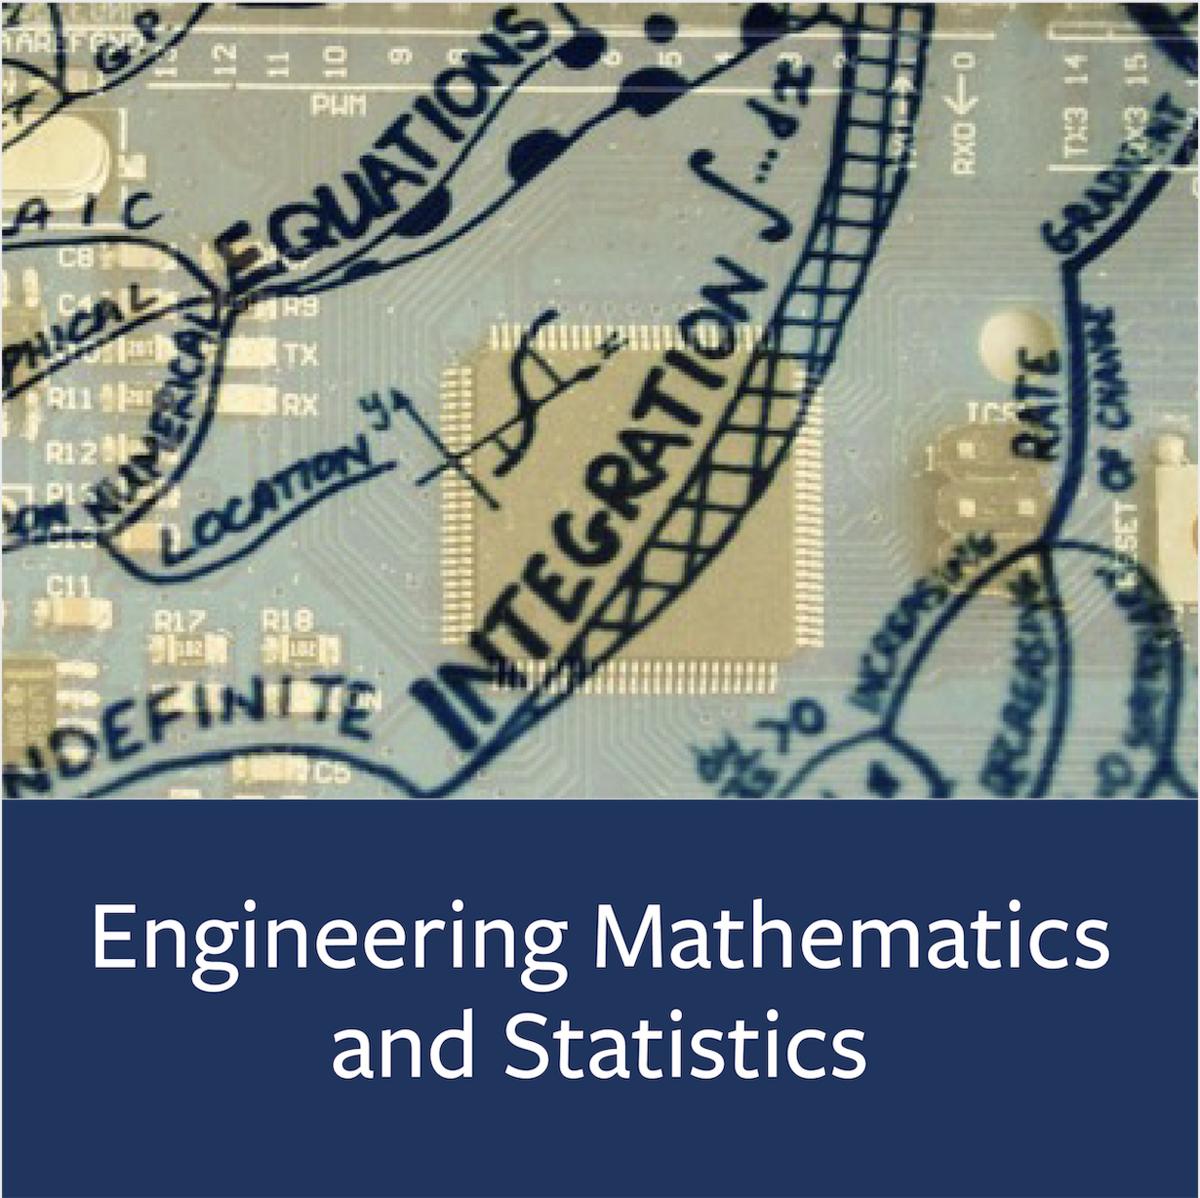 Engineering Mathematics and Statistics Major Map